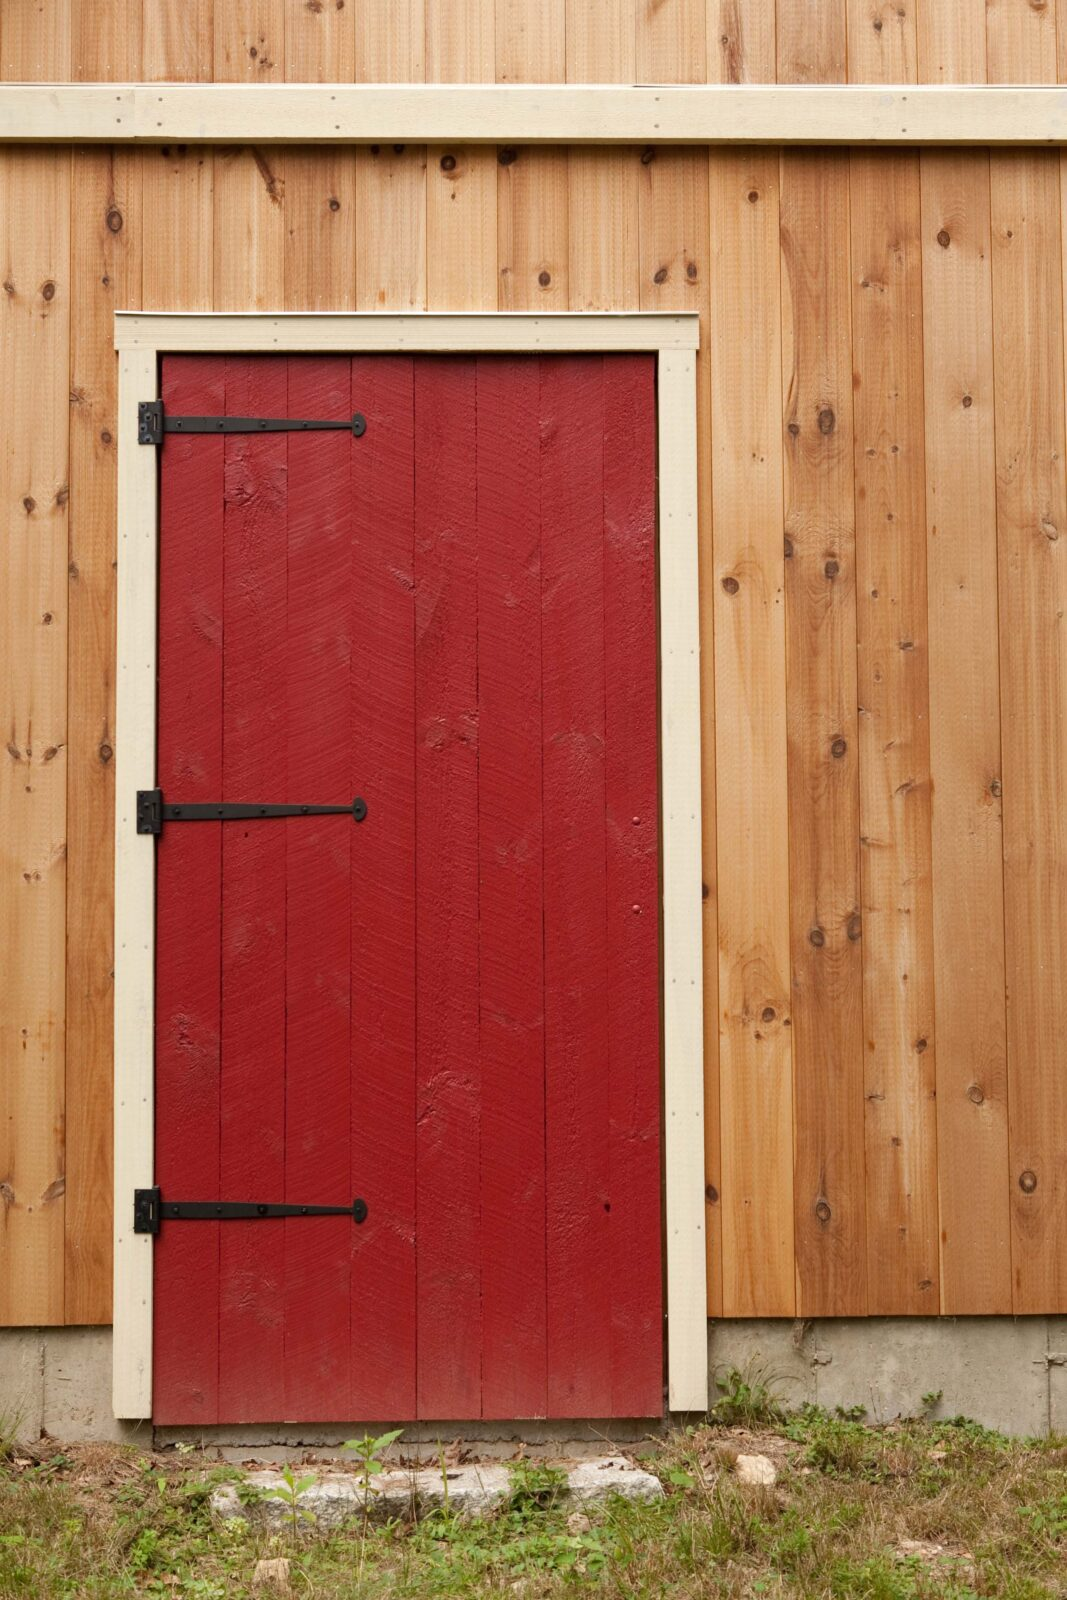 Red barn door entrance of Yankee Barn Home barn